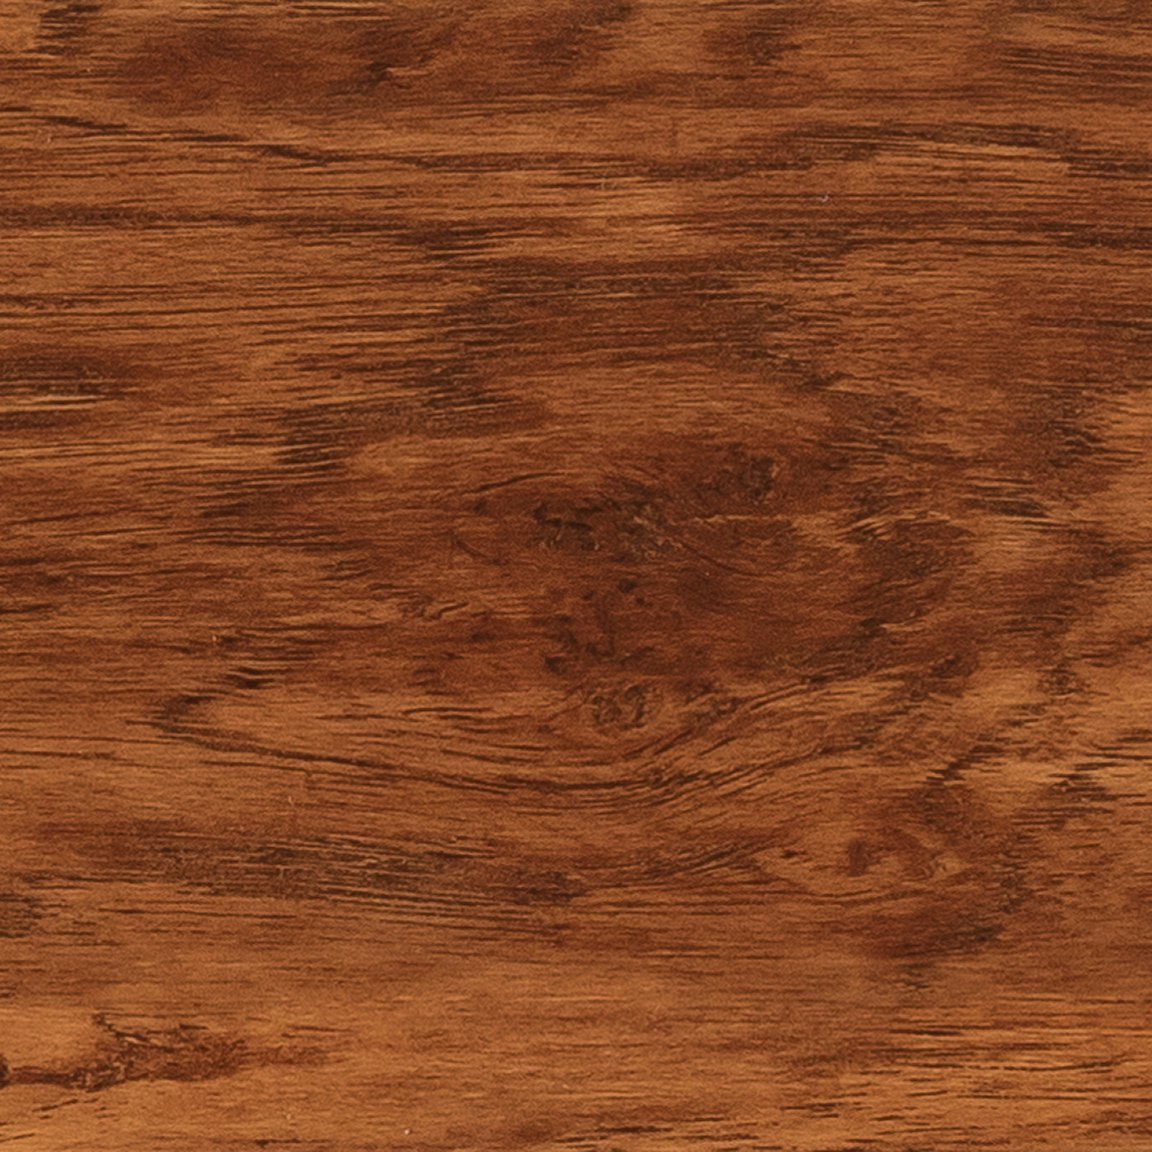 Mannington Select Wood Plank 5 X 48 Heritage Hickory Russet